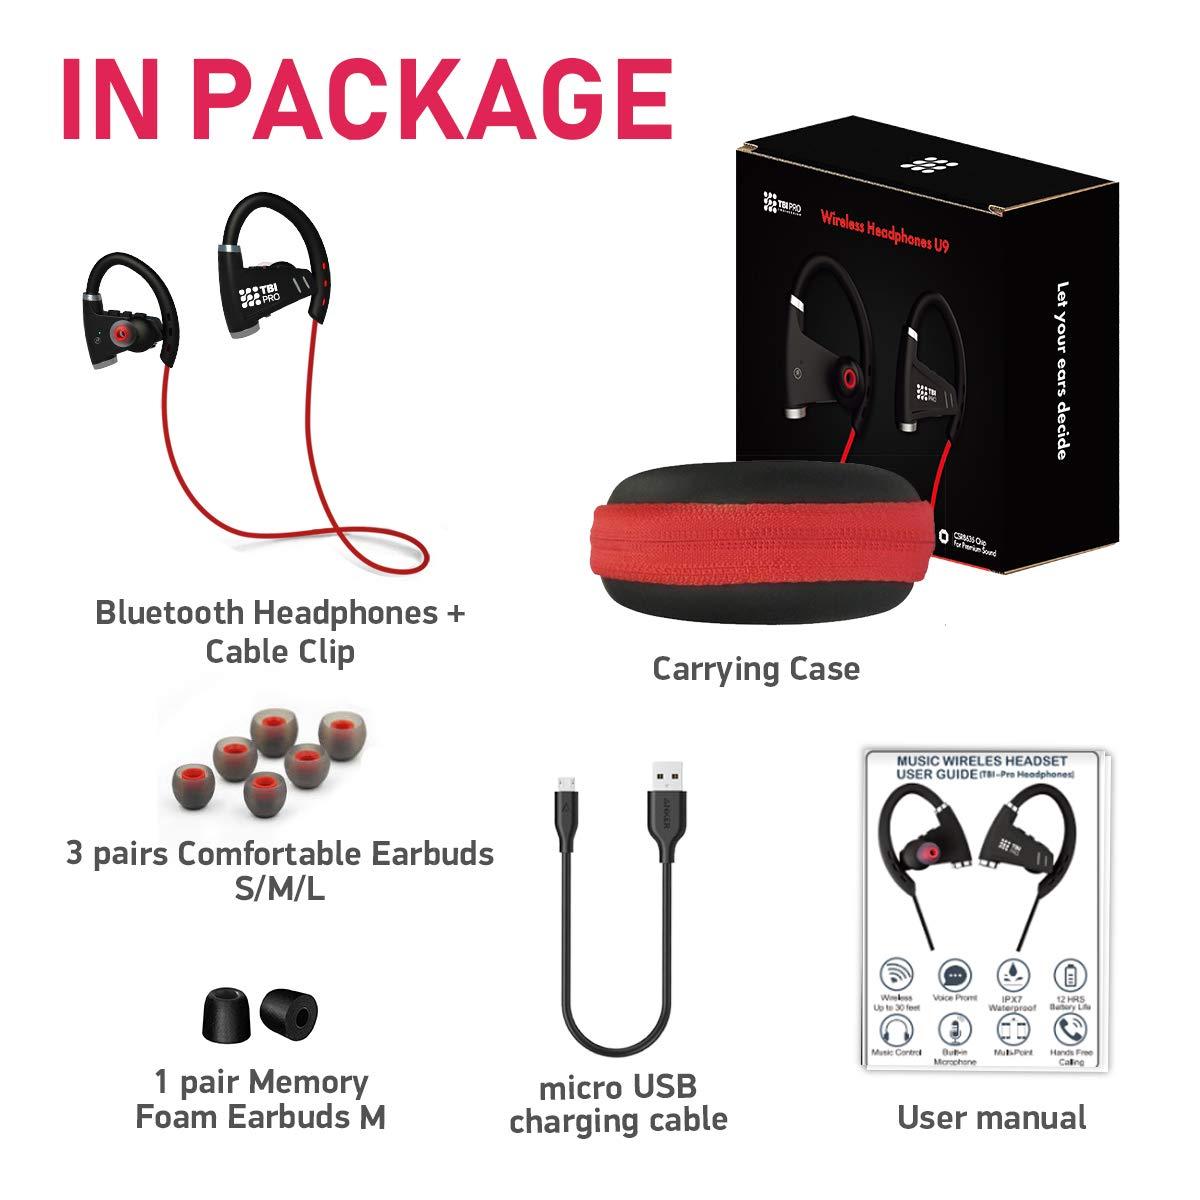 90ab83f6176 [Newest 2019] Bluetooth Headphones w/ 12+ Hours Battery - Best Wireless  Sport Earphones, Mic - IPX7 Waterproof Music in-Ear Earbuds Gym, Running,  ...